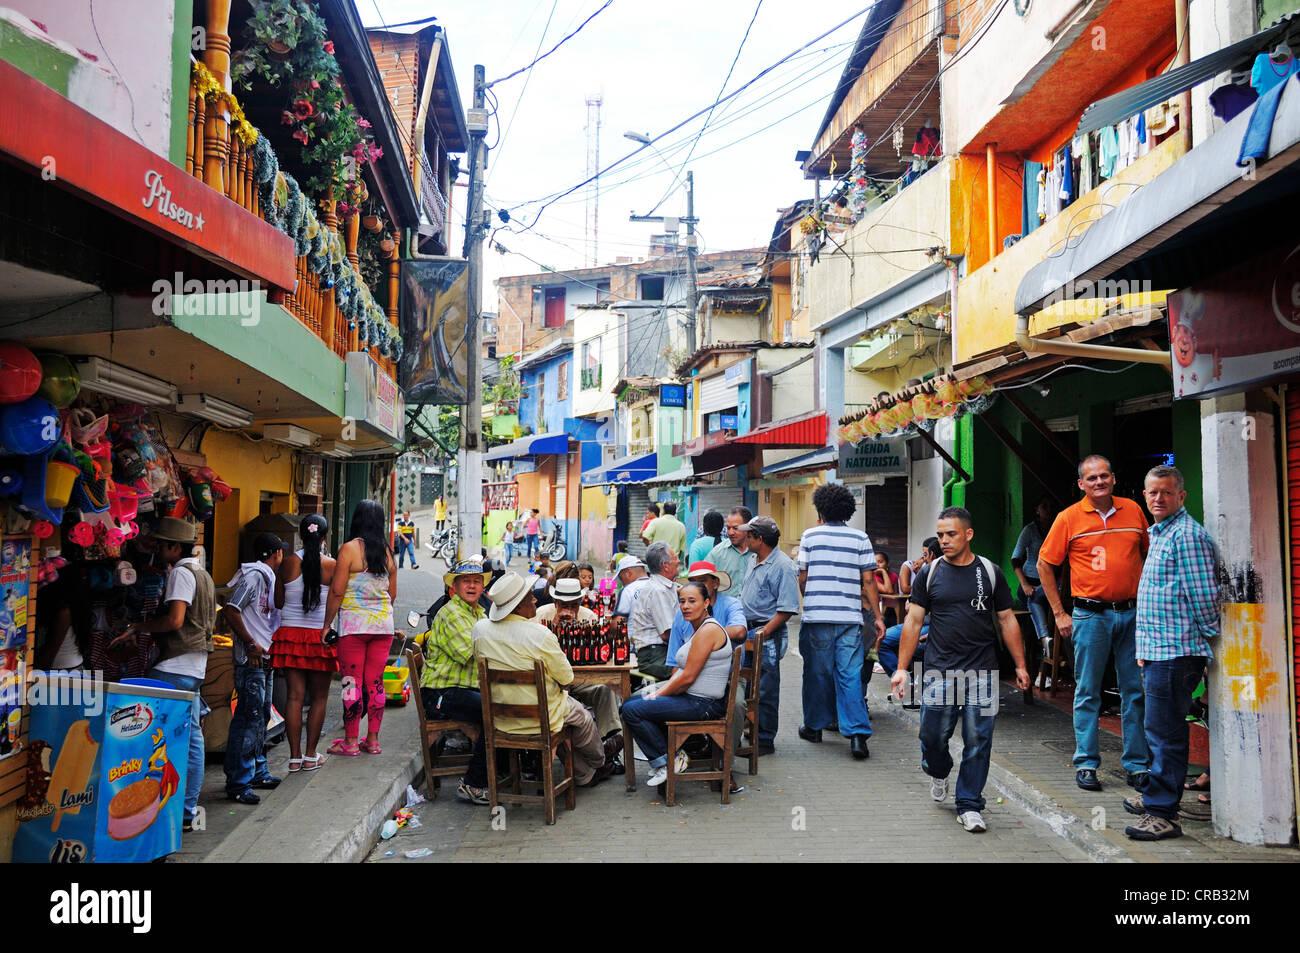 People celebrating in the streets, slums, Comuna 13, Medellin, Colombia, South America, Latin America, America - Stock Image